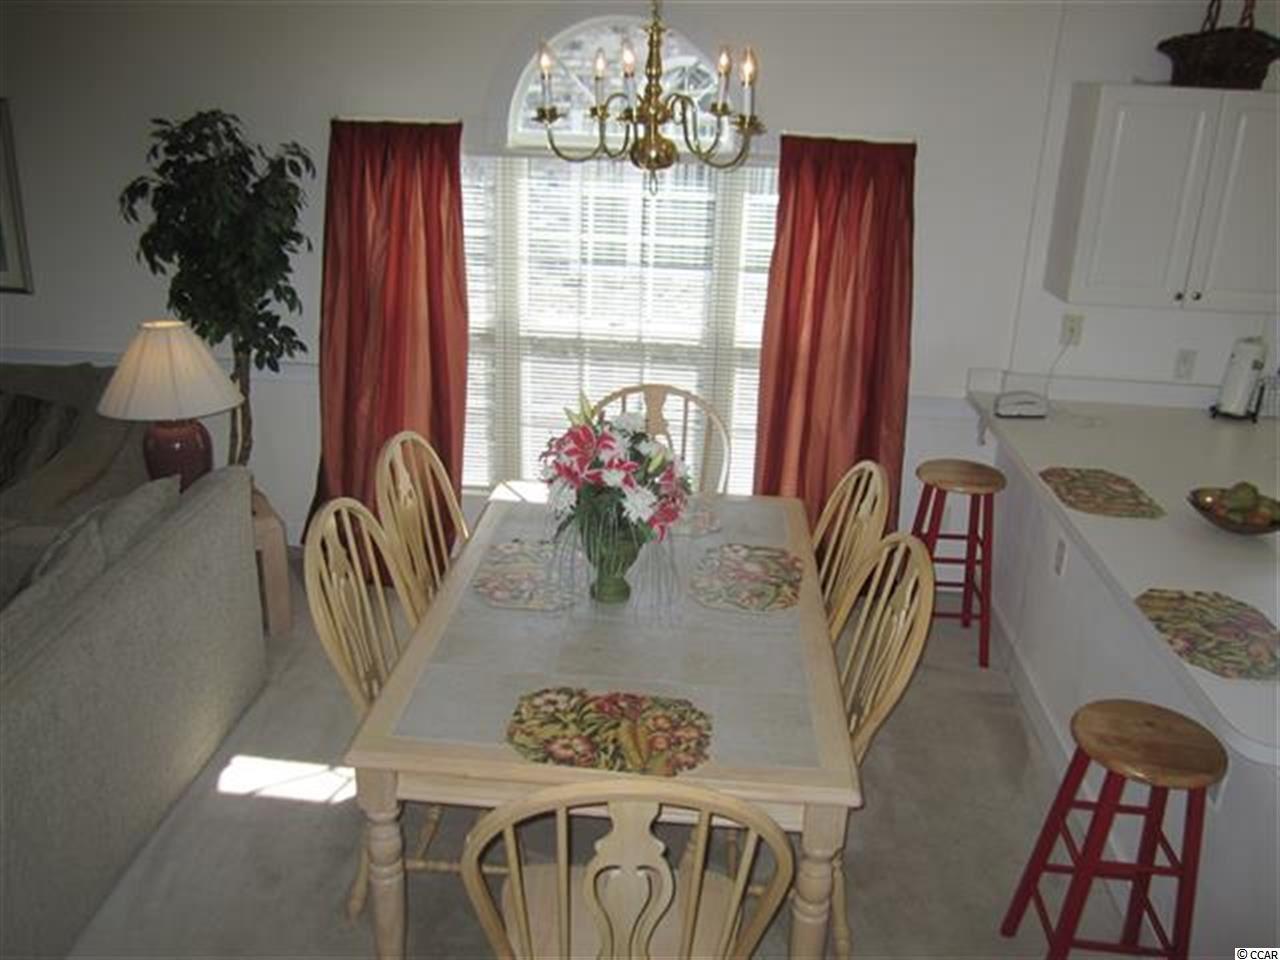 2 bedroom  MAGNOLIA PLACE condo for sale